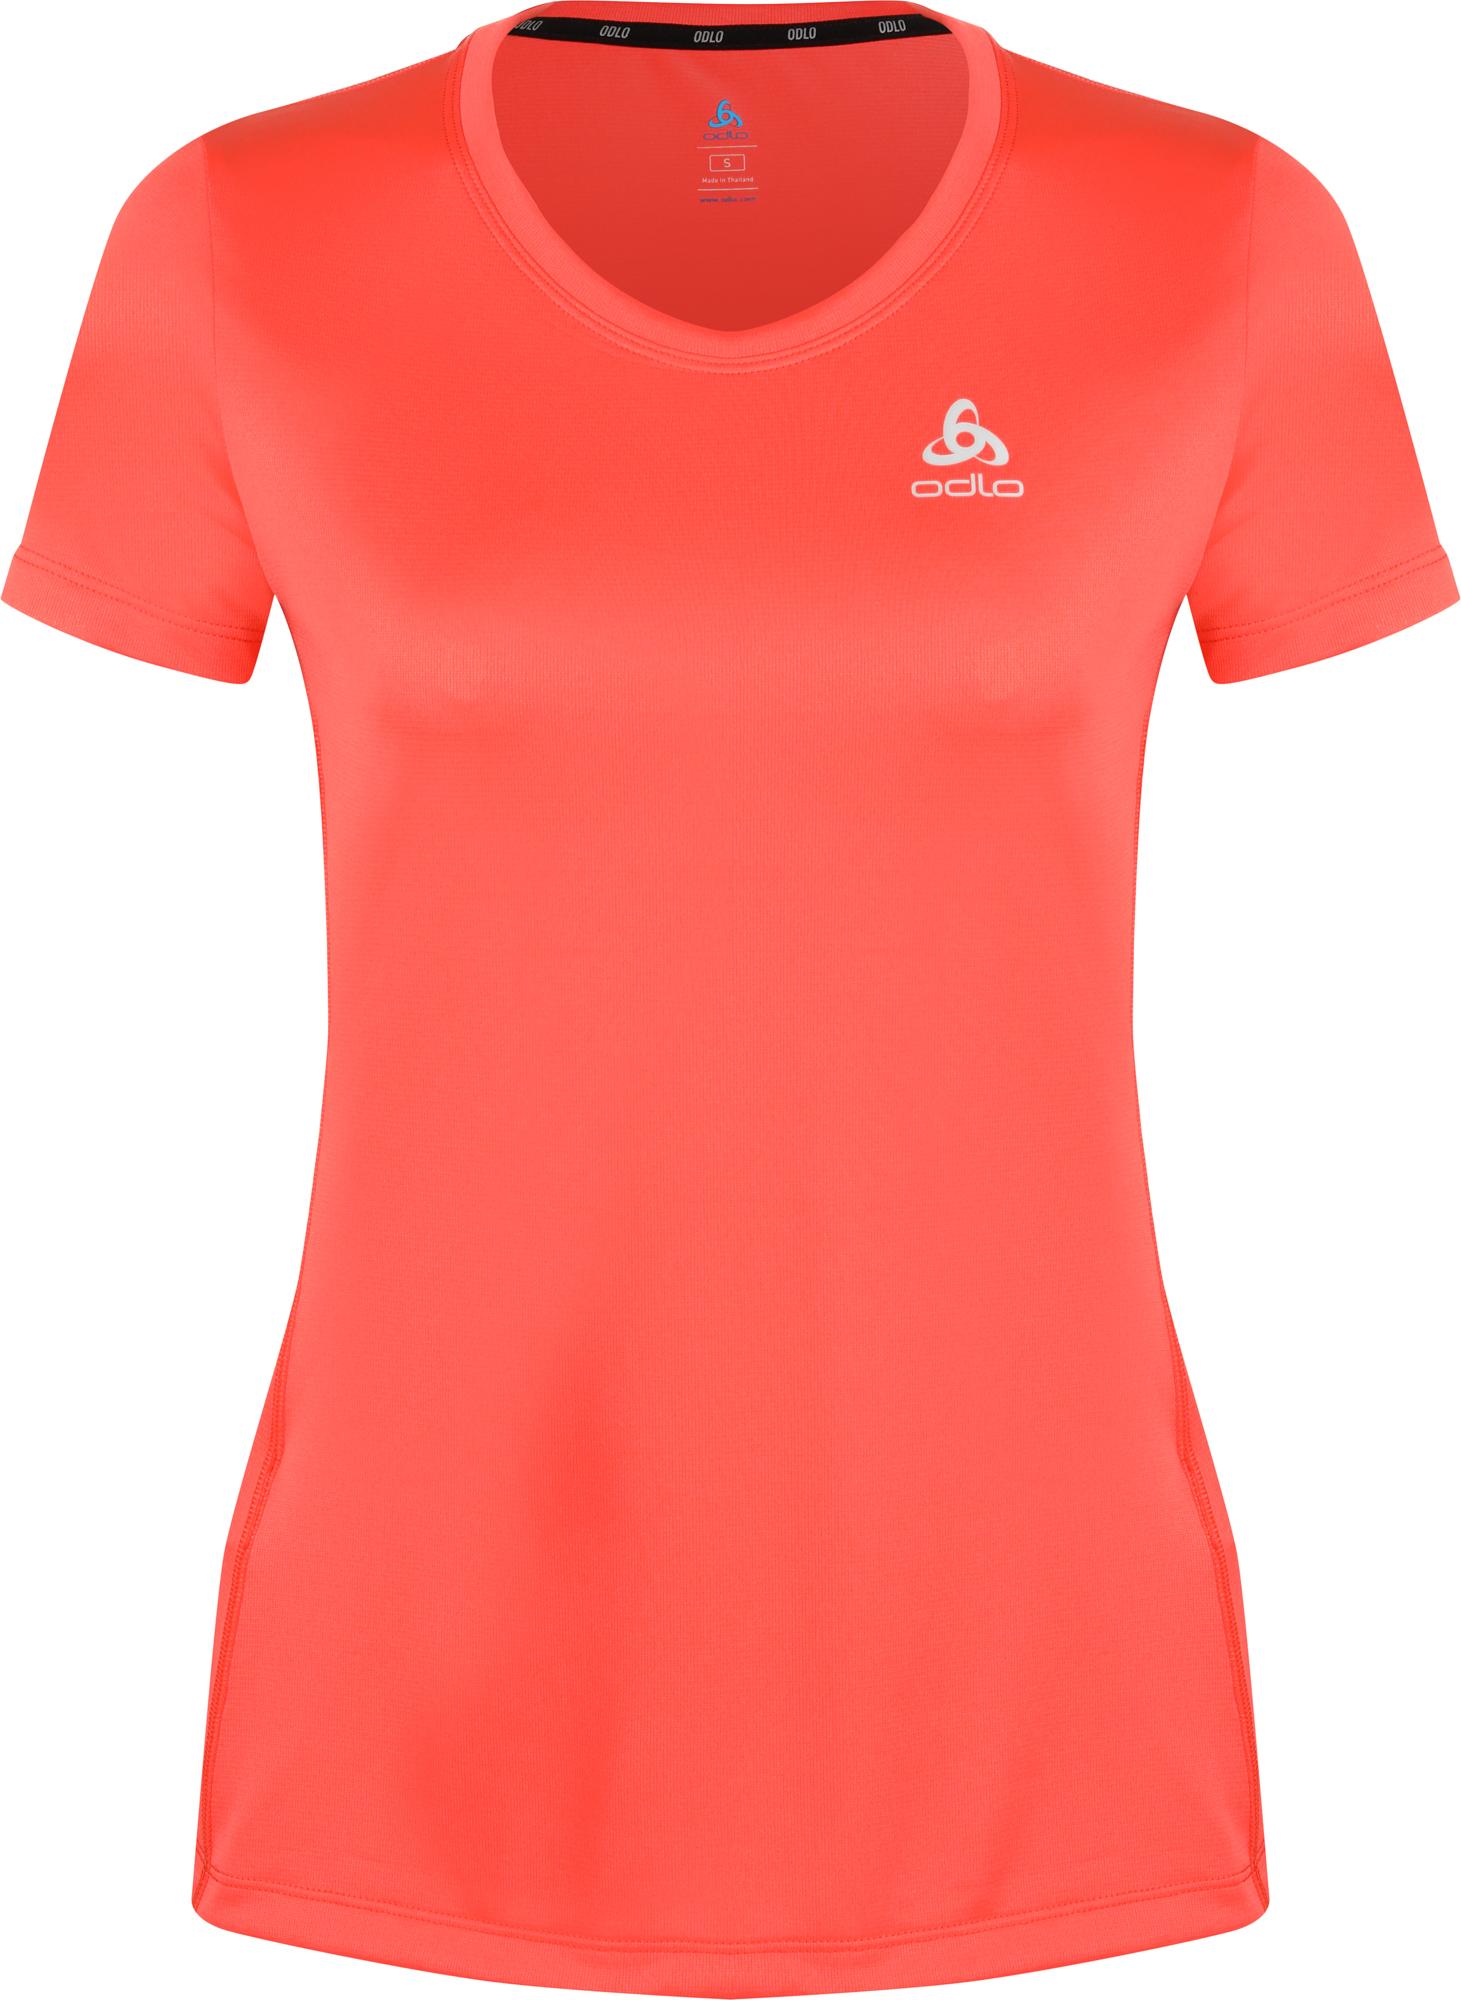 Odlo Футболка женская Odlo Element, размер 44-46 odlo футболка женская odlo millennium размер 46 48